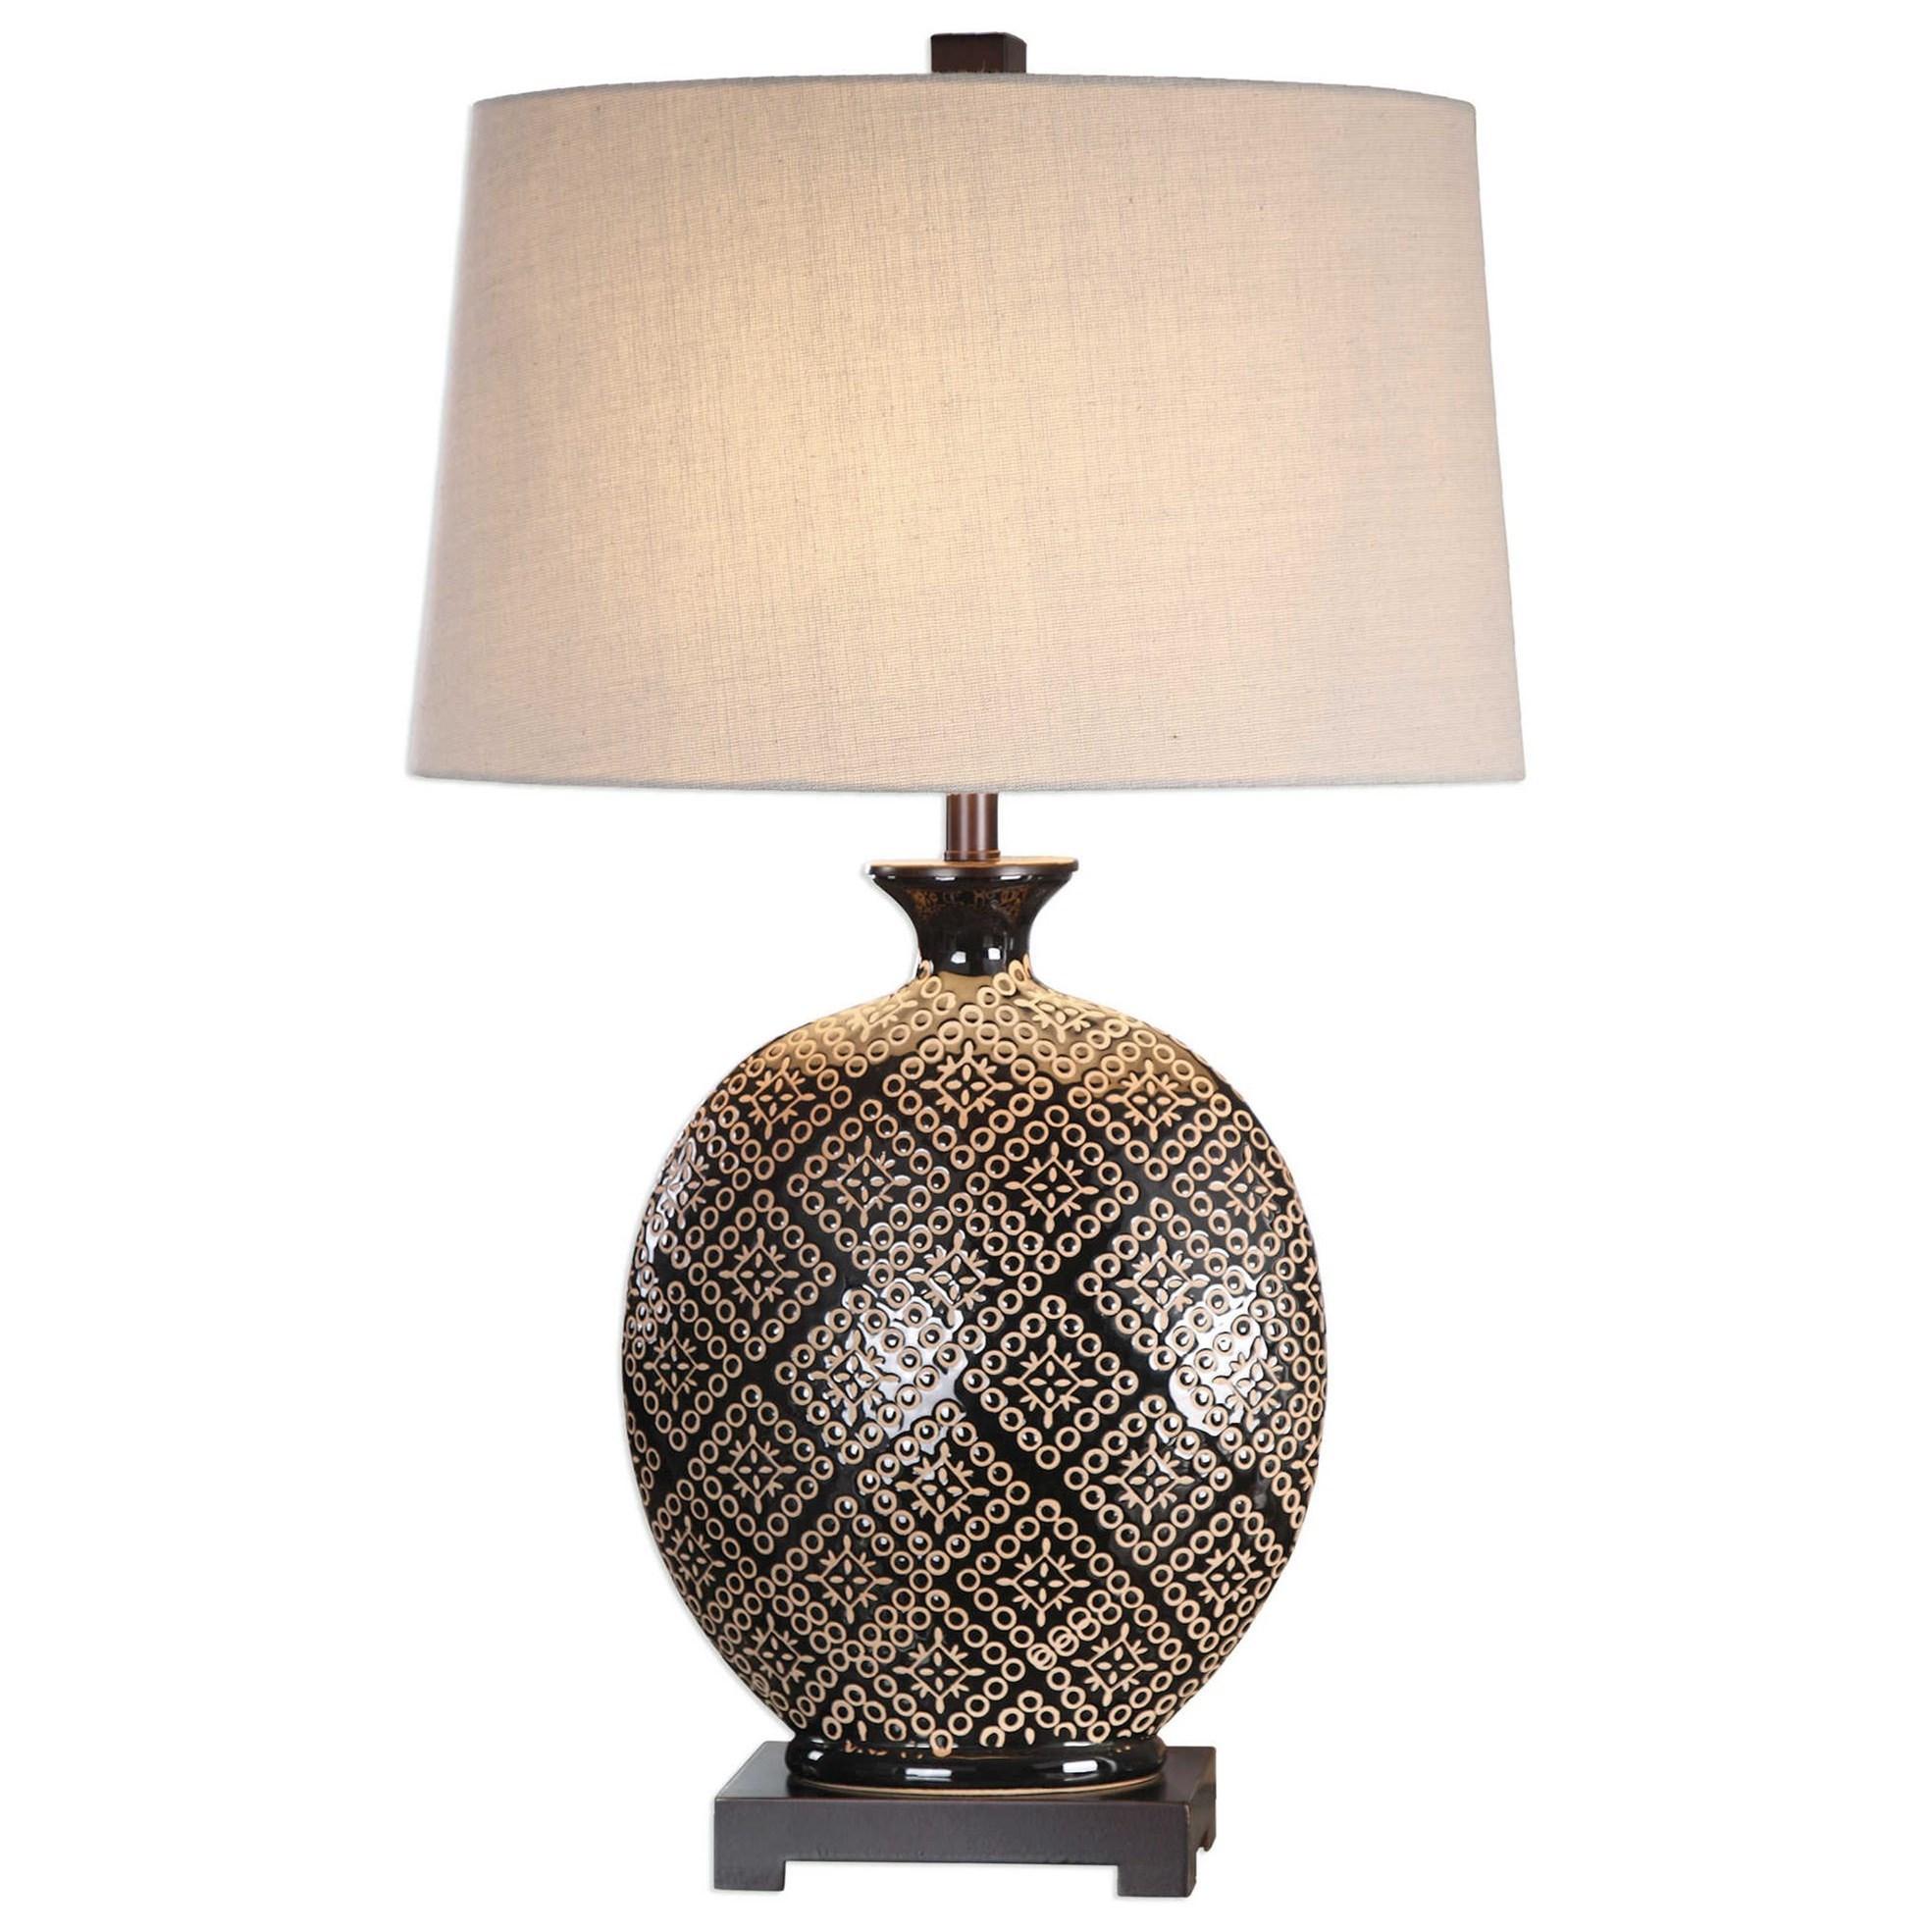 Kelda Gloss Black Glazed Lamp